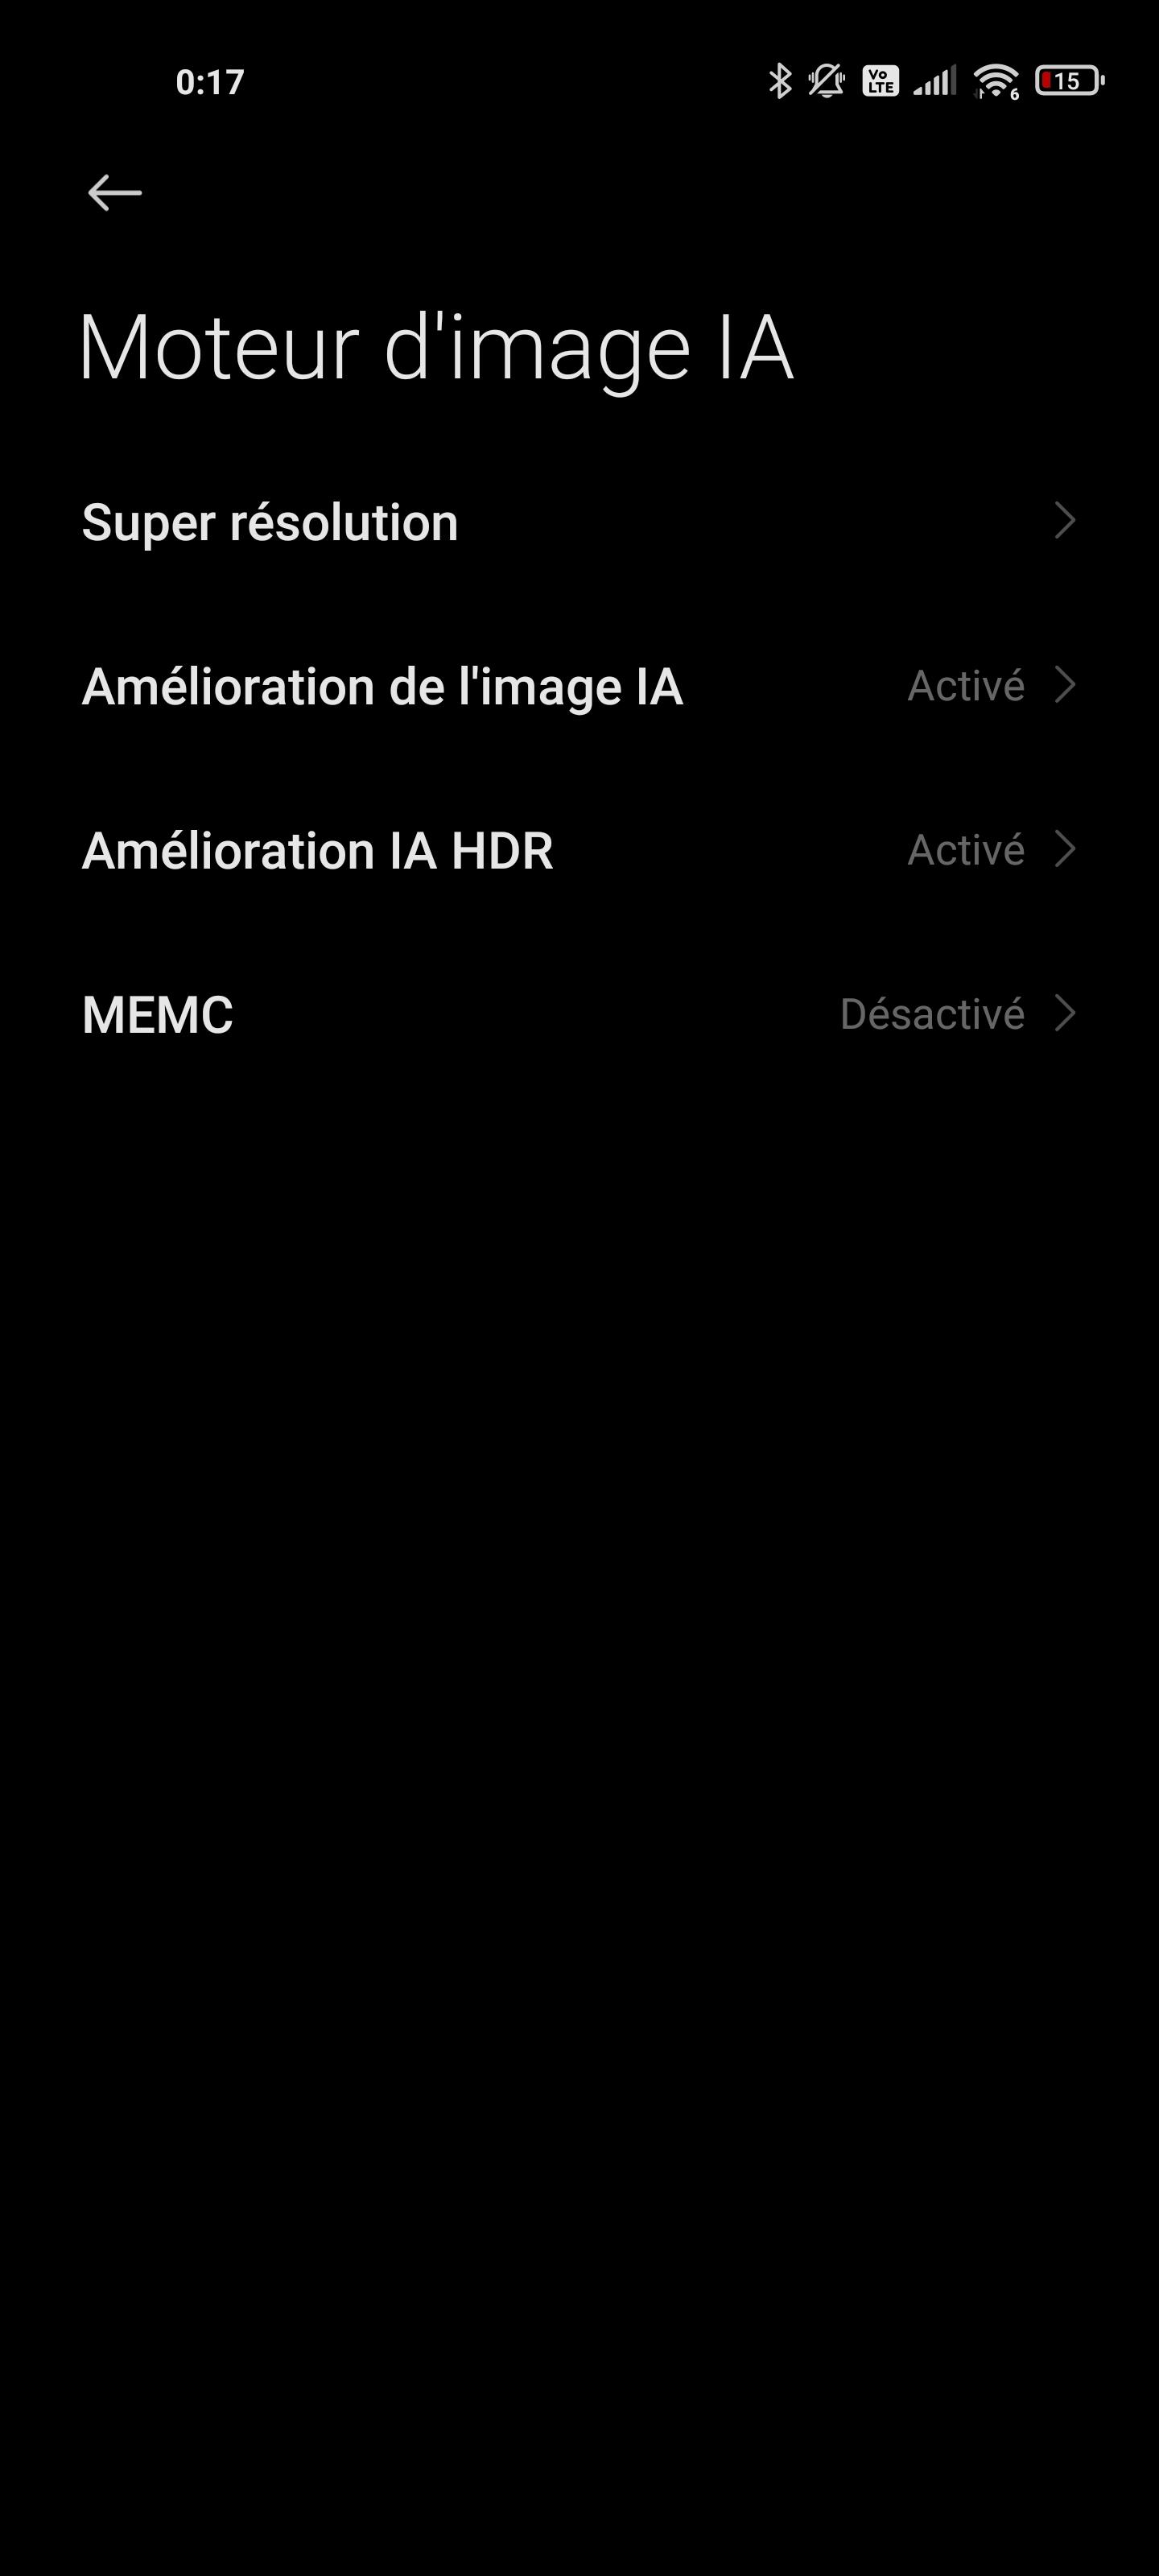 Screenshot_2021-03-15-00-17-09-257_com.android.settings.jpg